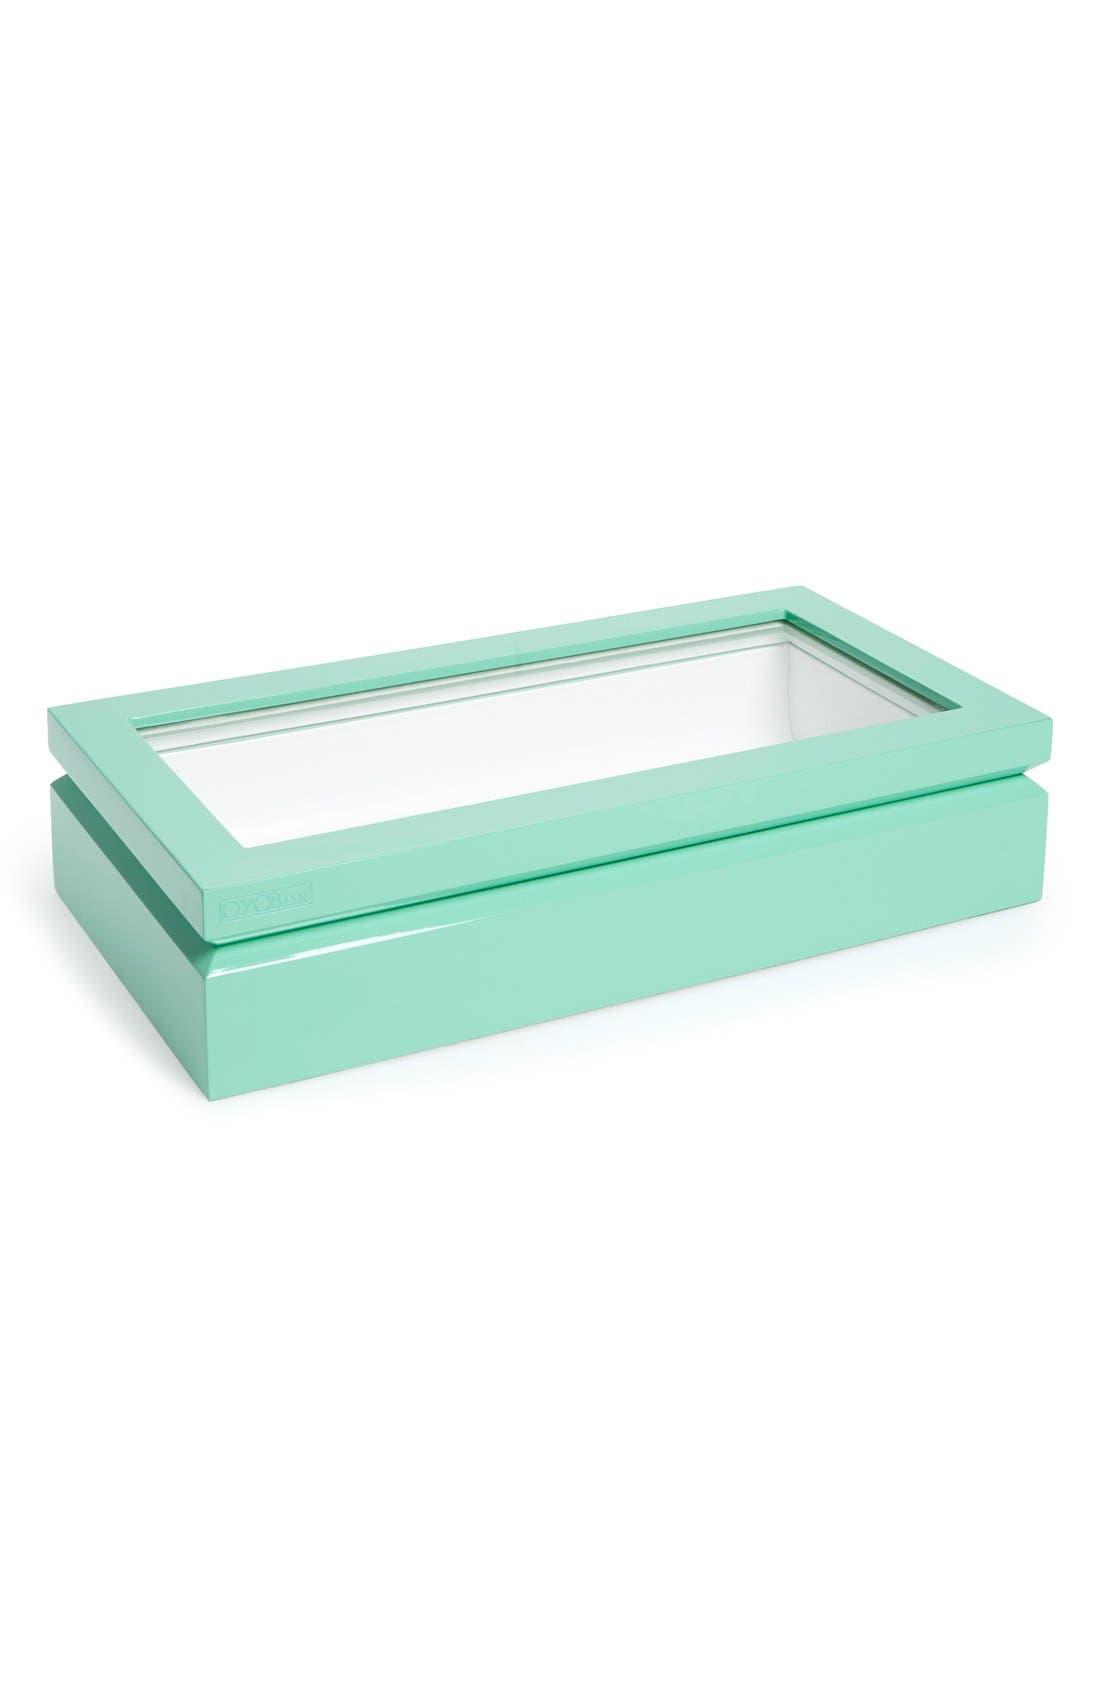 Lacquered Wood Window Top Eyewear Organizer Case,                             Main thumbnail 1, color,                             Aqua